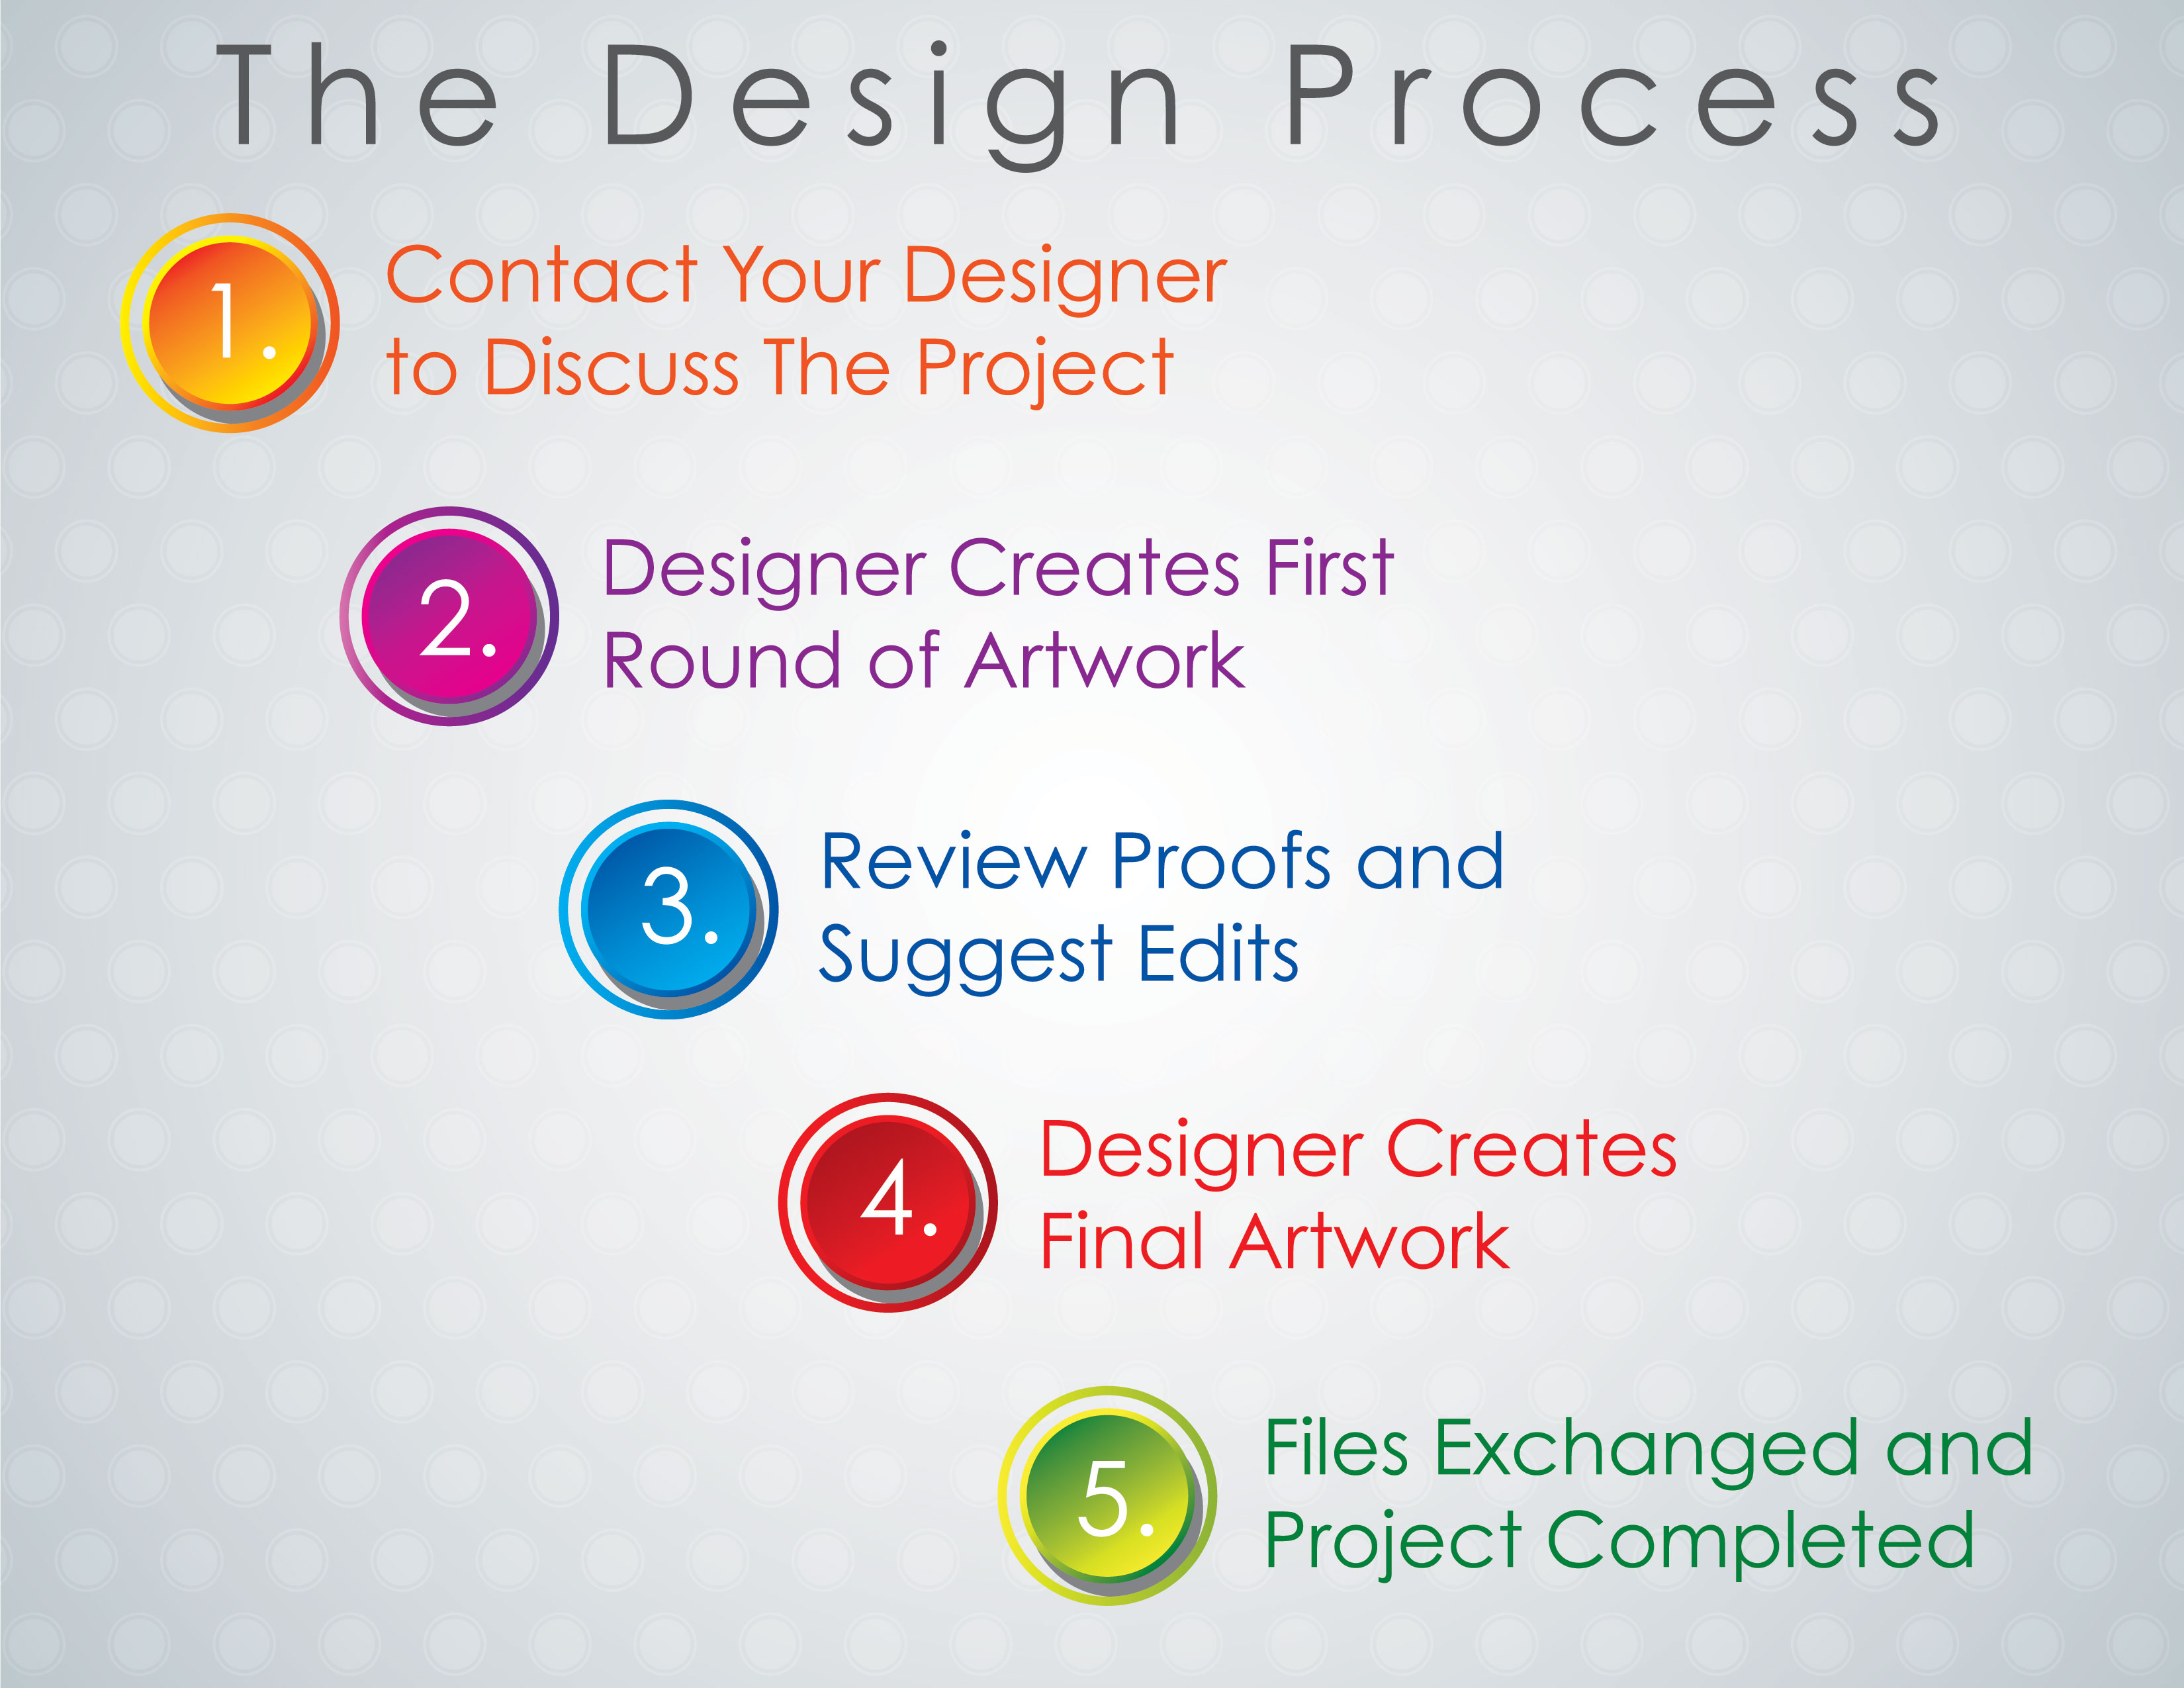 The Design Process Graphic